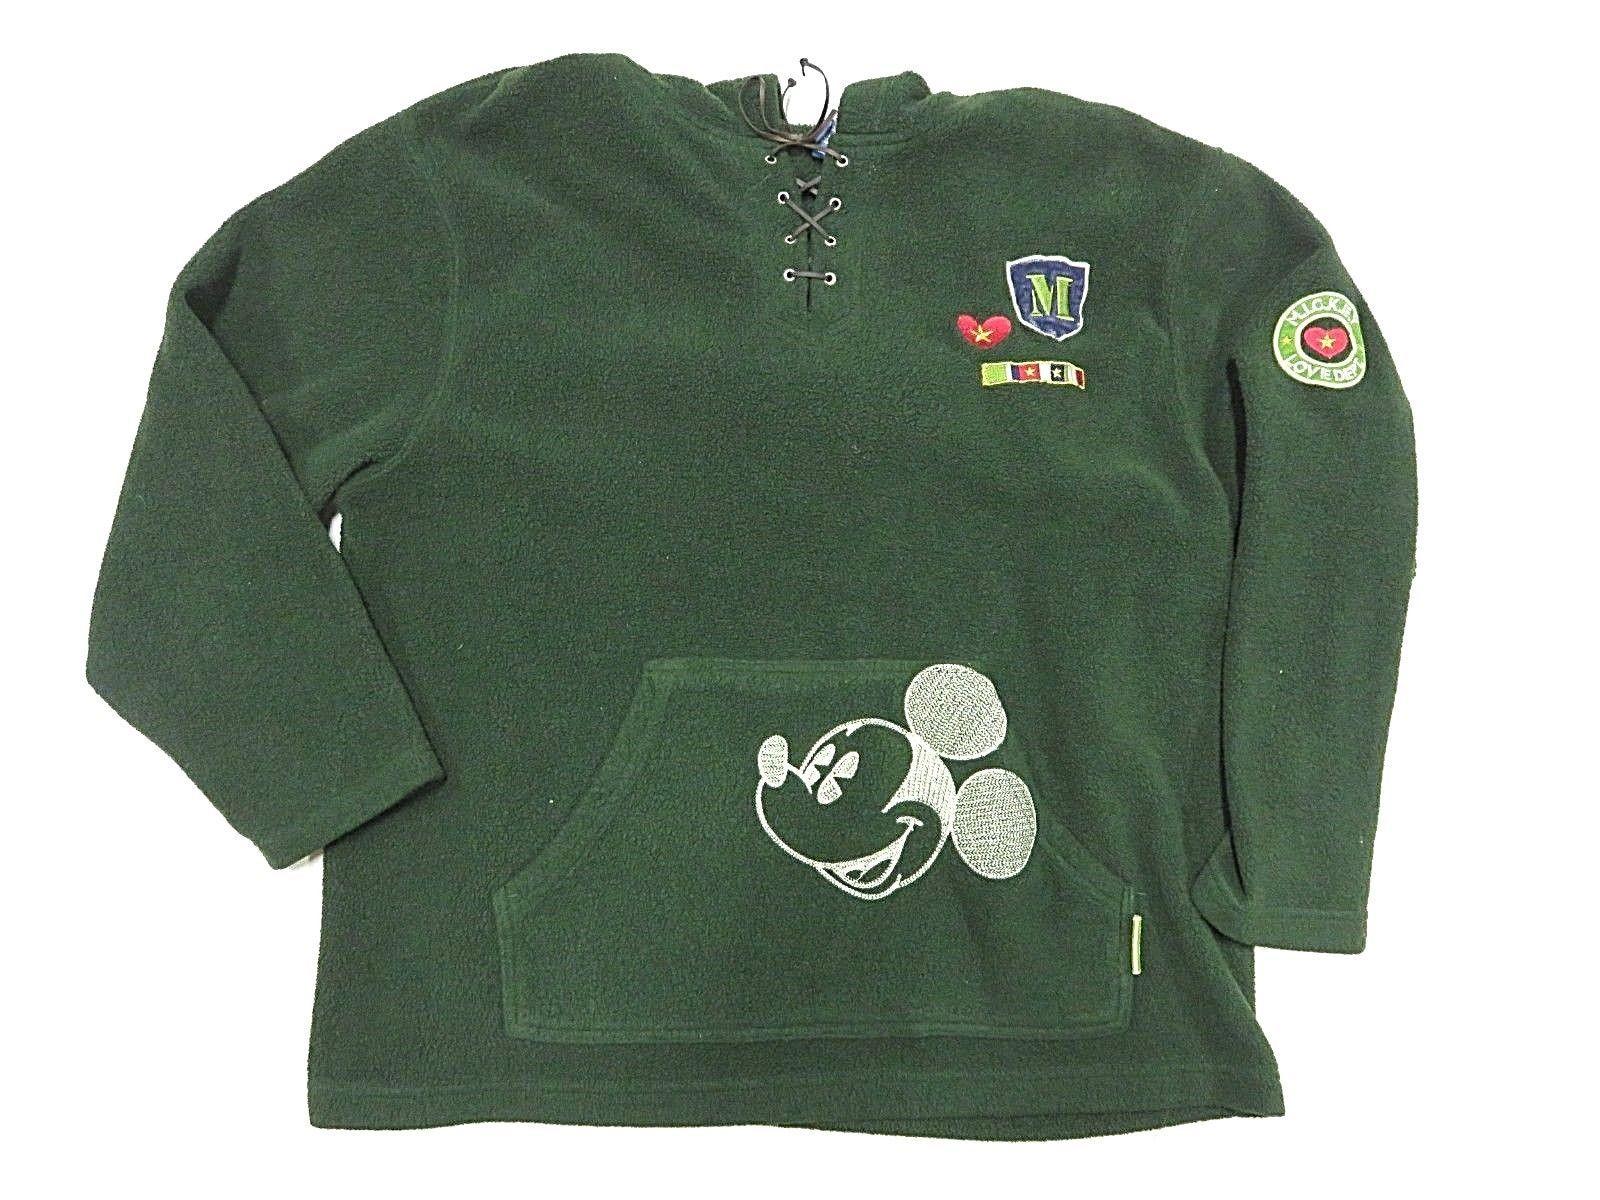 1287321b 90s VTG Disney Green Fleece Hooded Pullover and 50 similar items